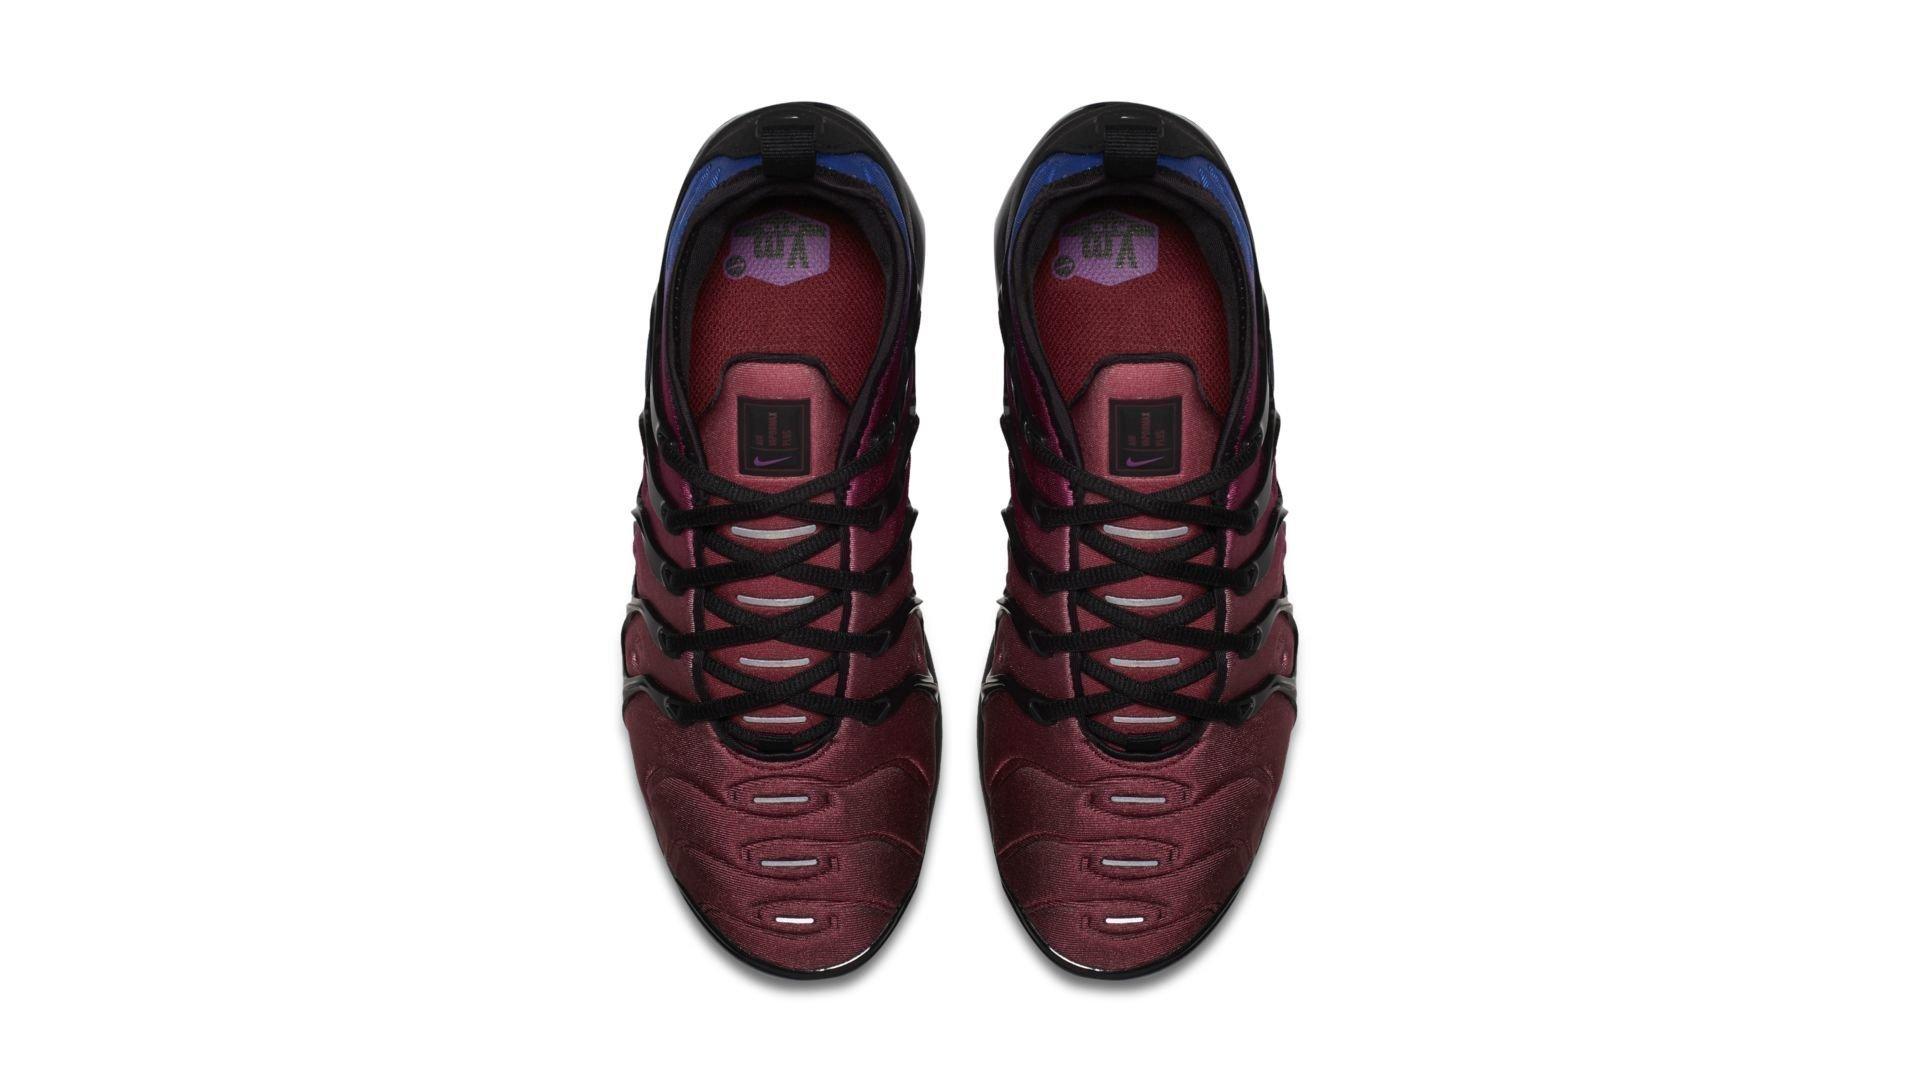 Nike Air VaporMax Plus Black Team Red Hyper Violet (W) (AO4550-001)